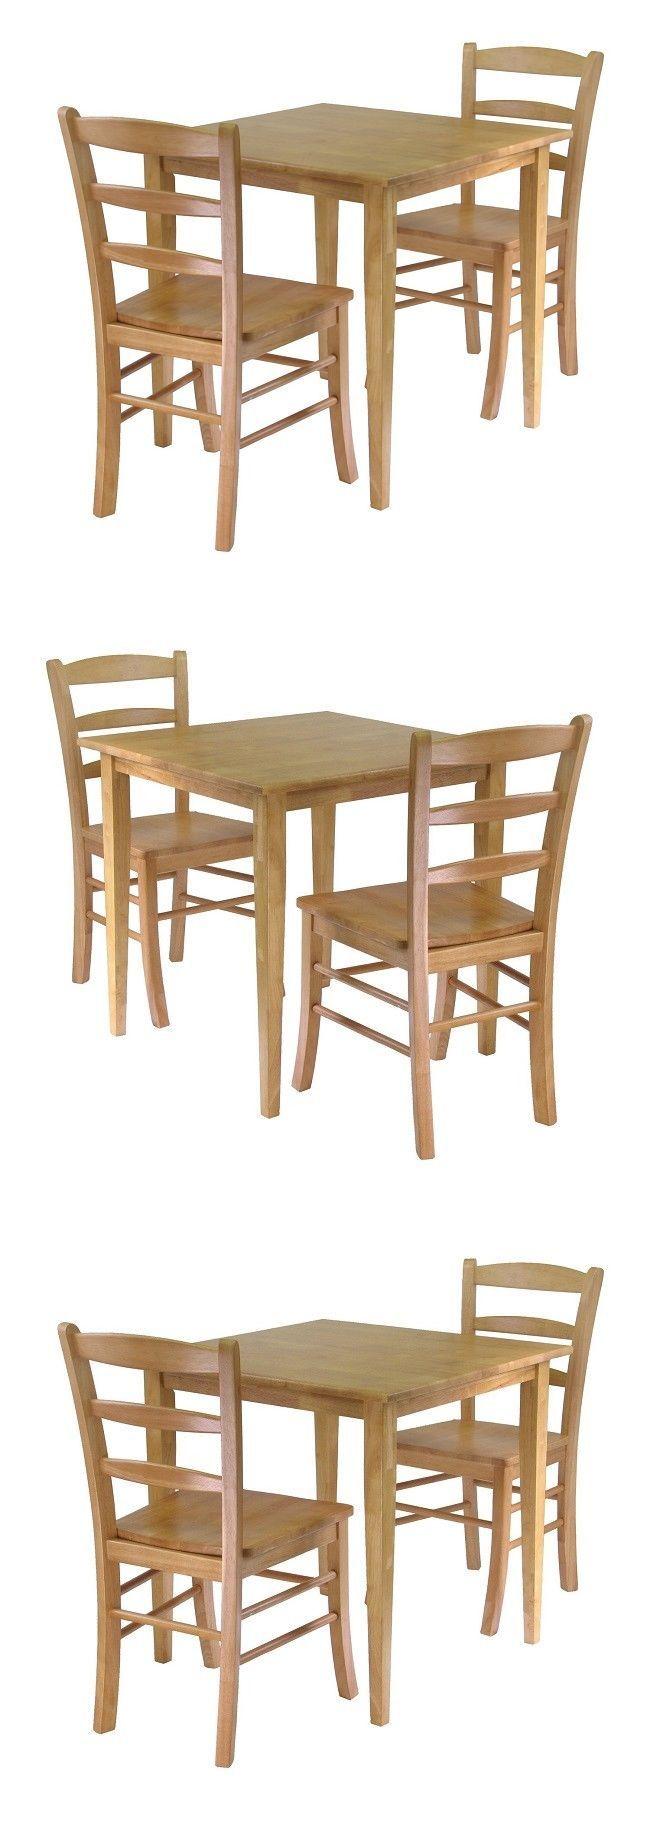 Space saving dining tables wenge minima simple aluminium dining table - 25 Best Small Dining Table Set Ideas On Pinterest Small Dining Sets Corner Nook Dining Set And Dining Table Settings